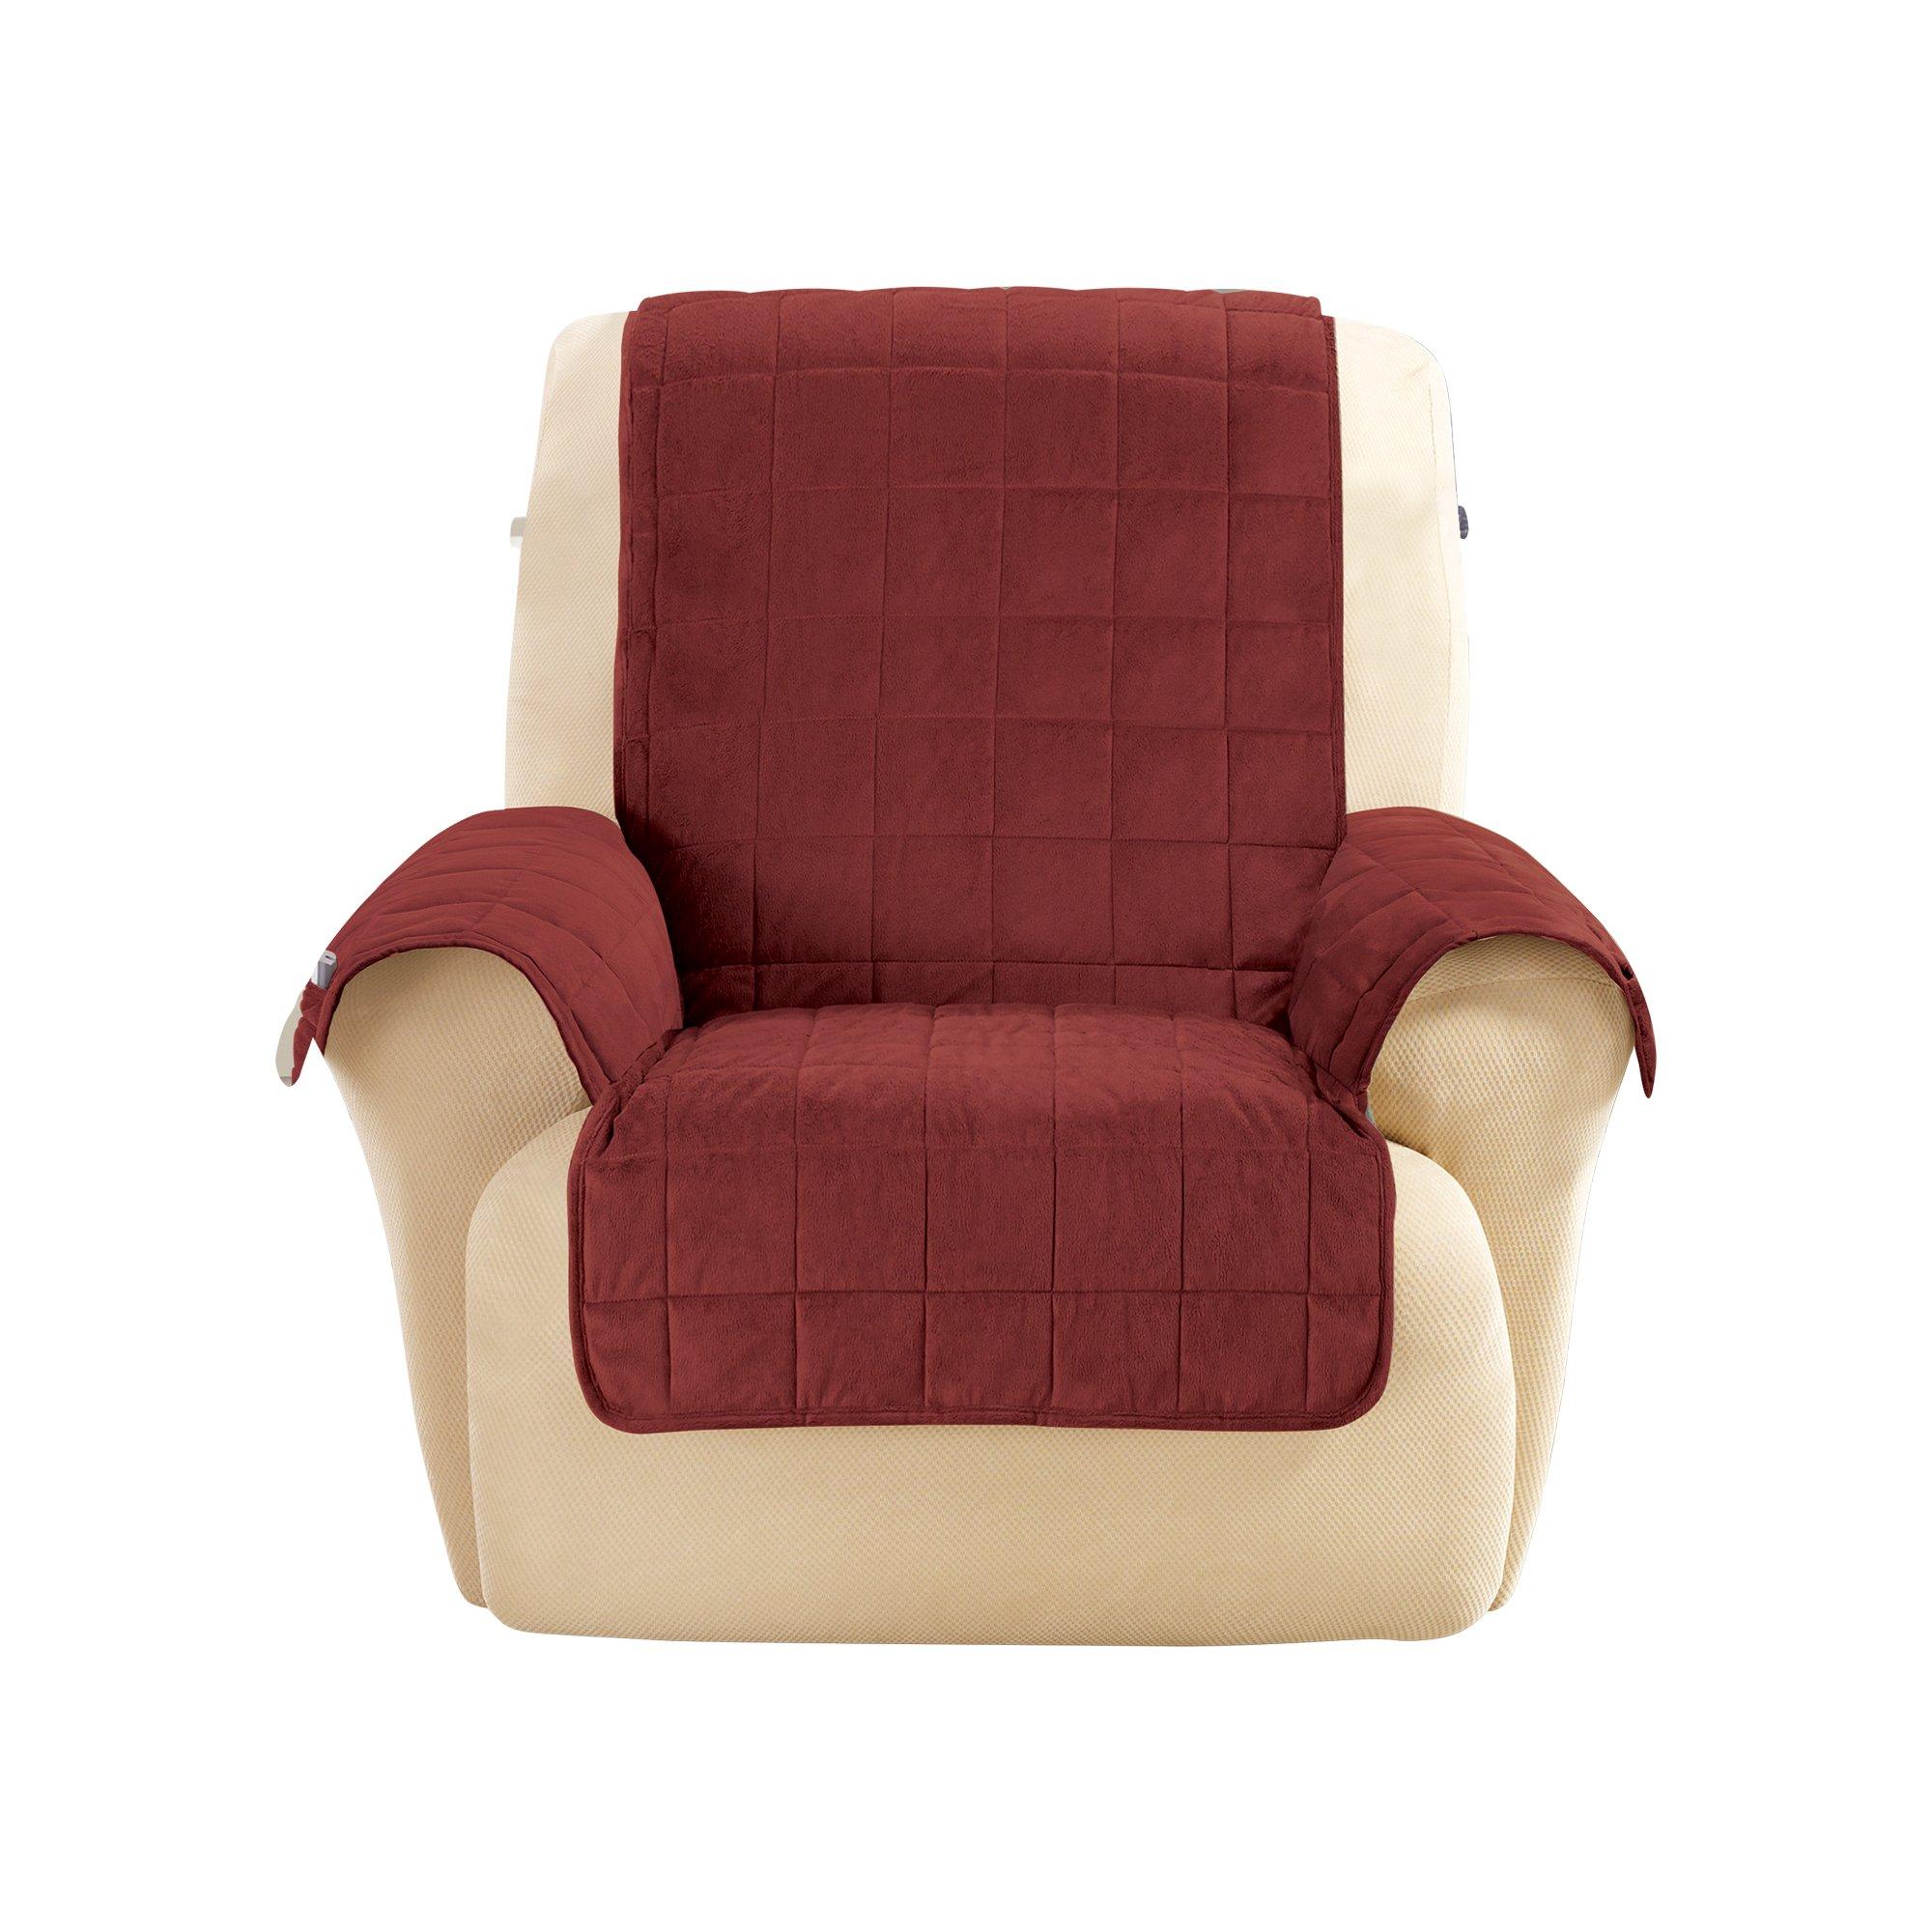 Sure Fit Deep Pile Velvet Recliner Furniture Cover - Burgundy (SF43708)